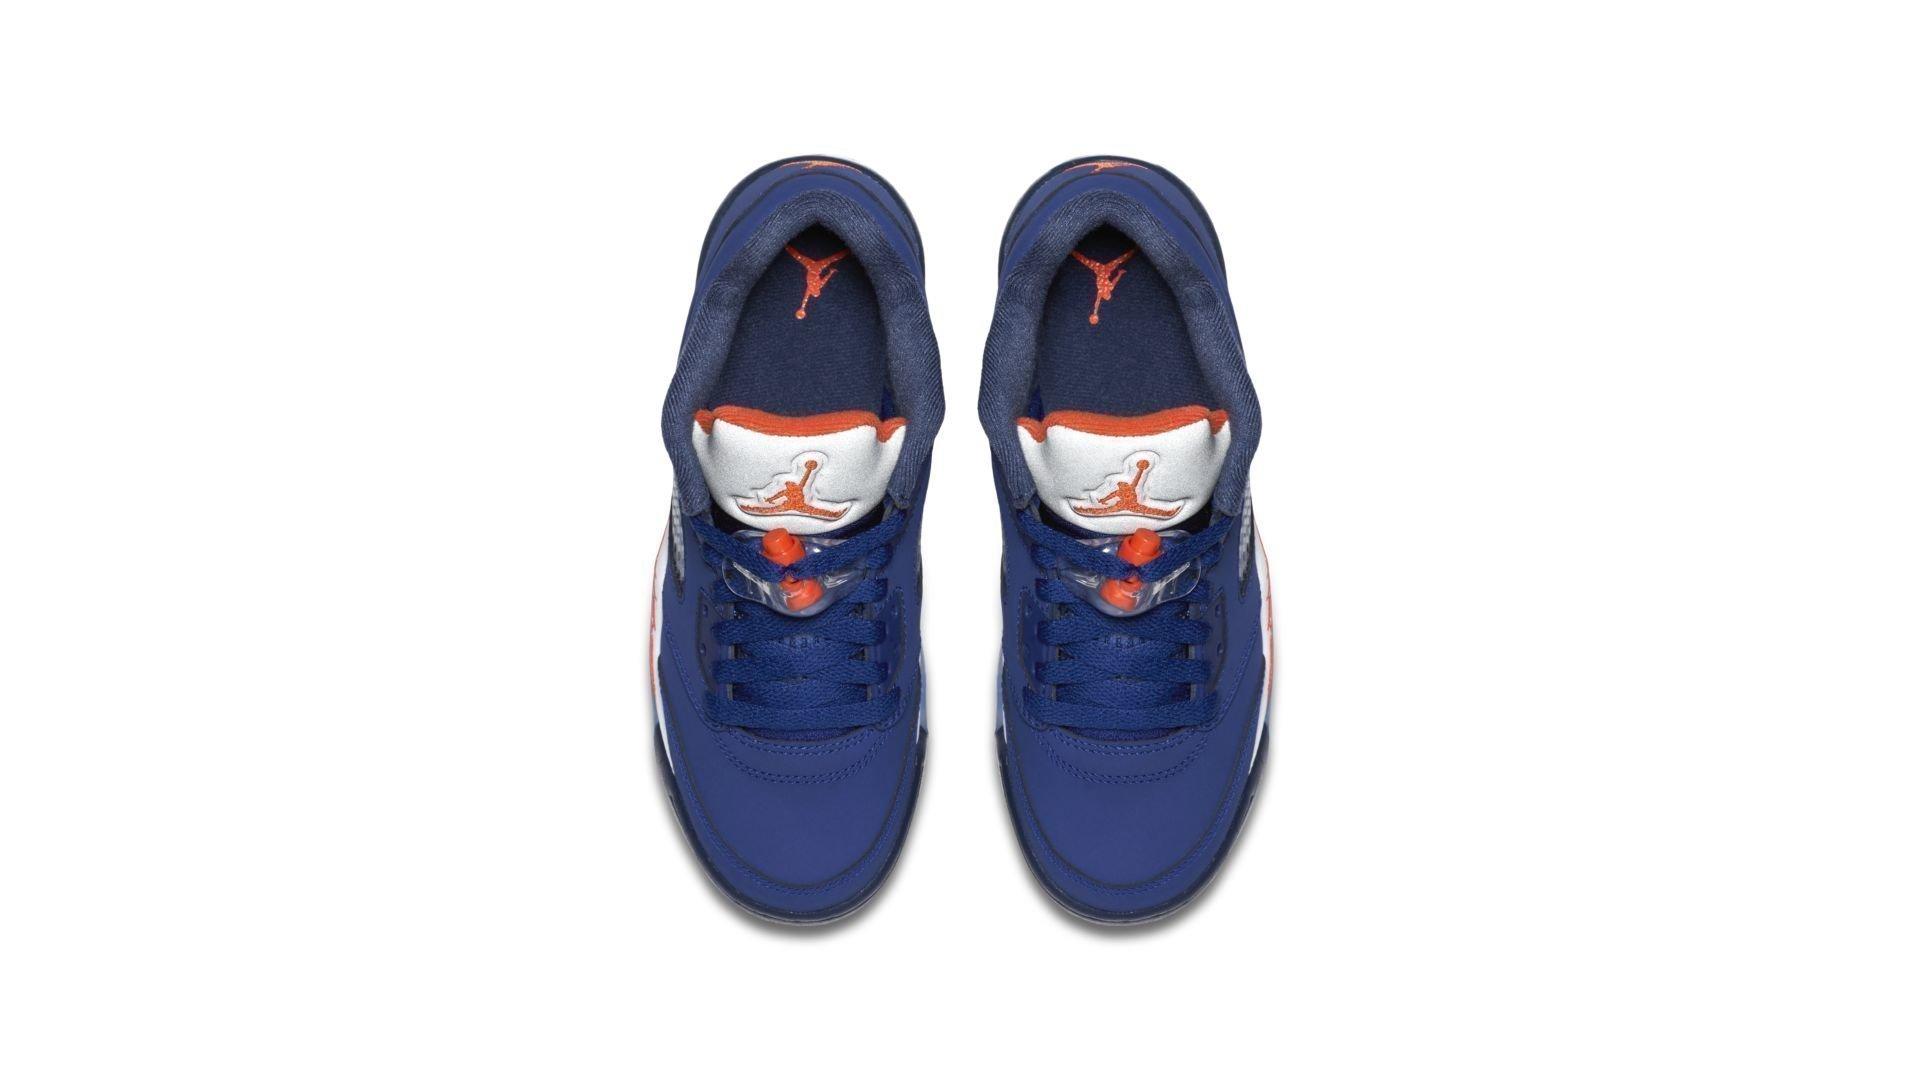 Jordan 5 Retro Low Knicks (GS) (314338-417)